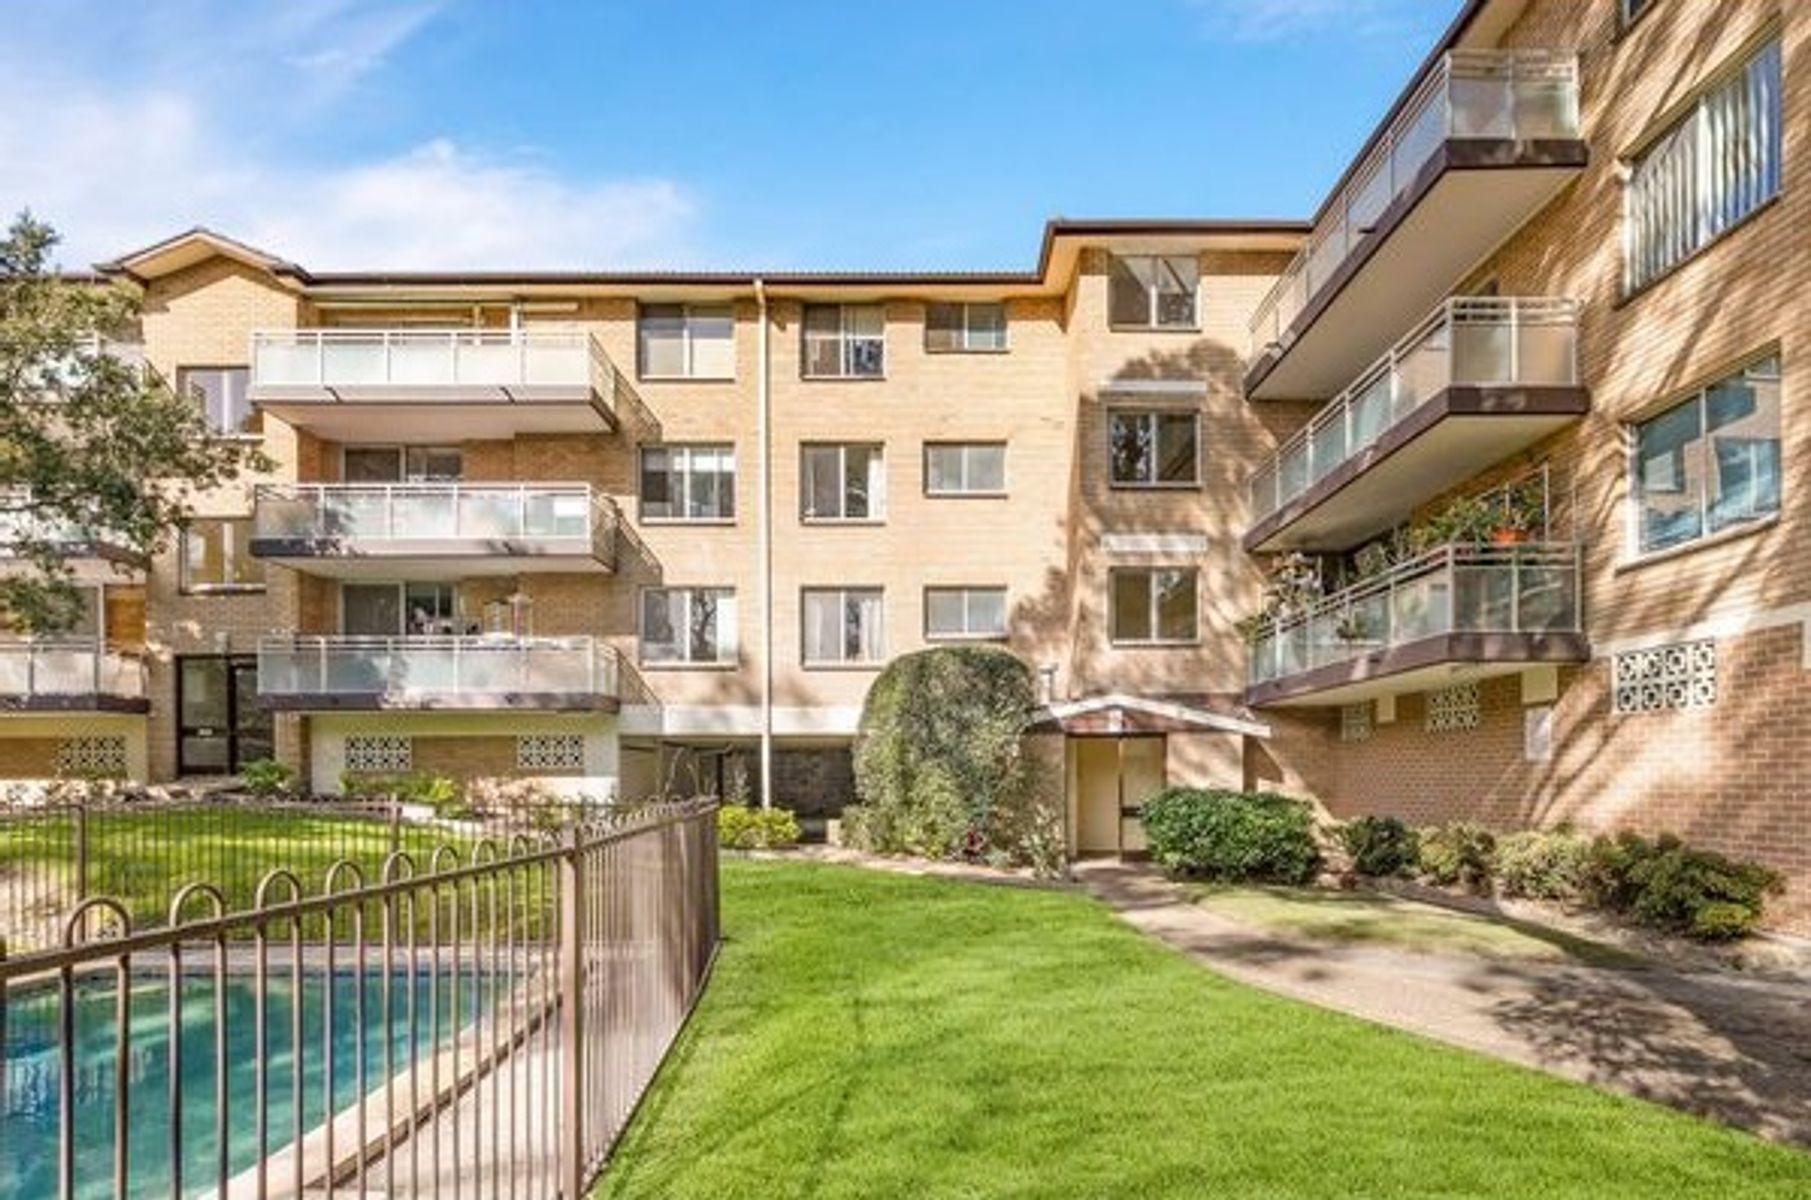 92/1C Kooringa Road, Chatswood, NSW 2067